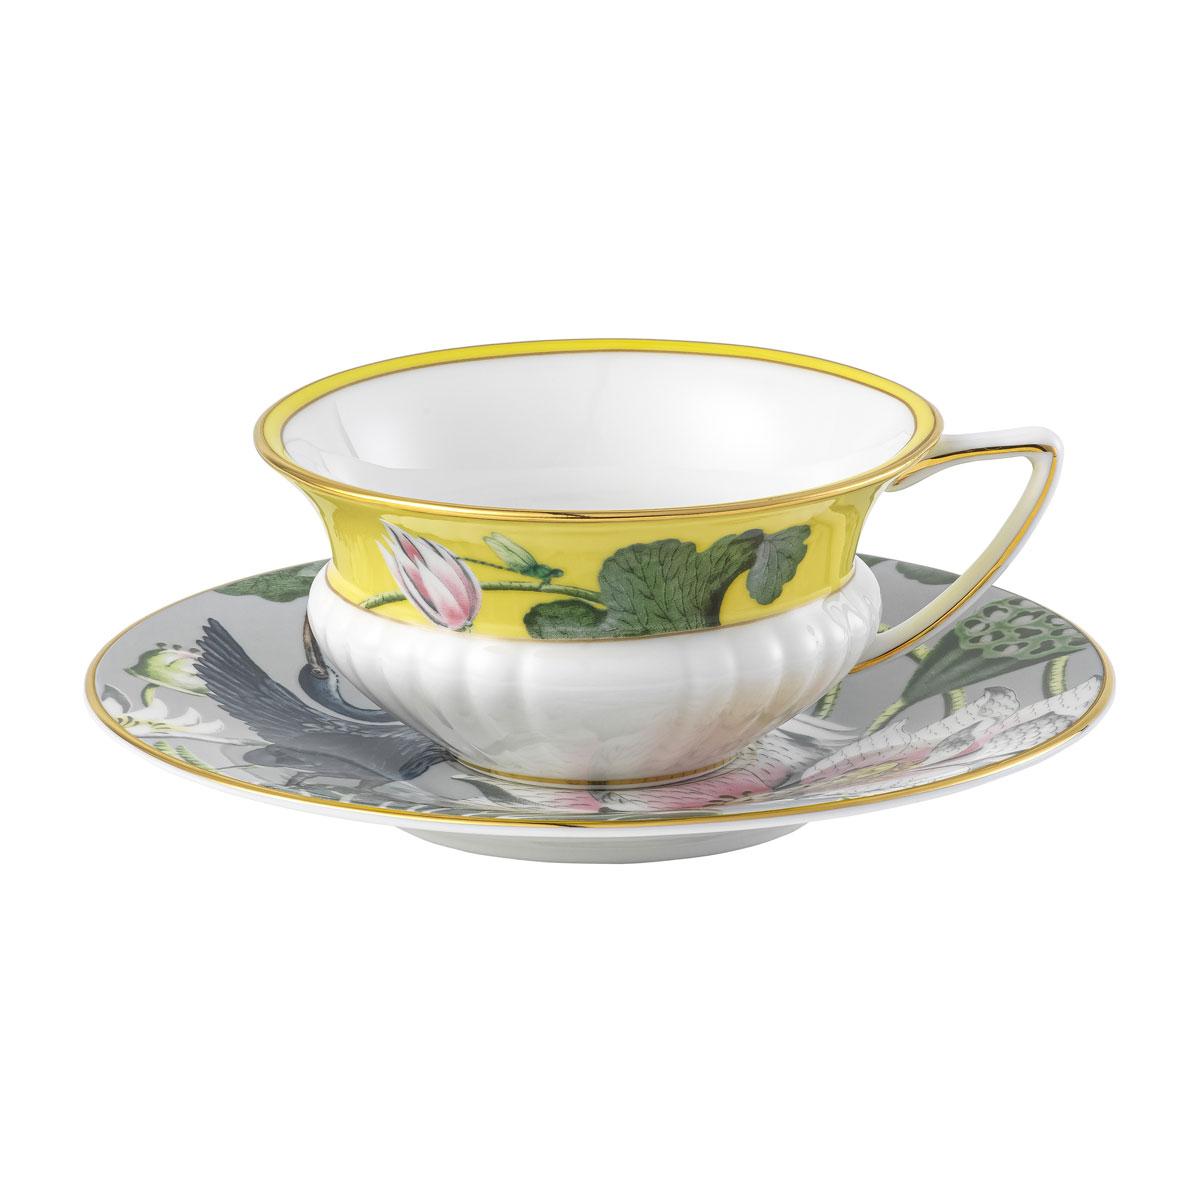 Wedgwood Wonderlust Waterlily Teacup and Saucer